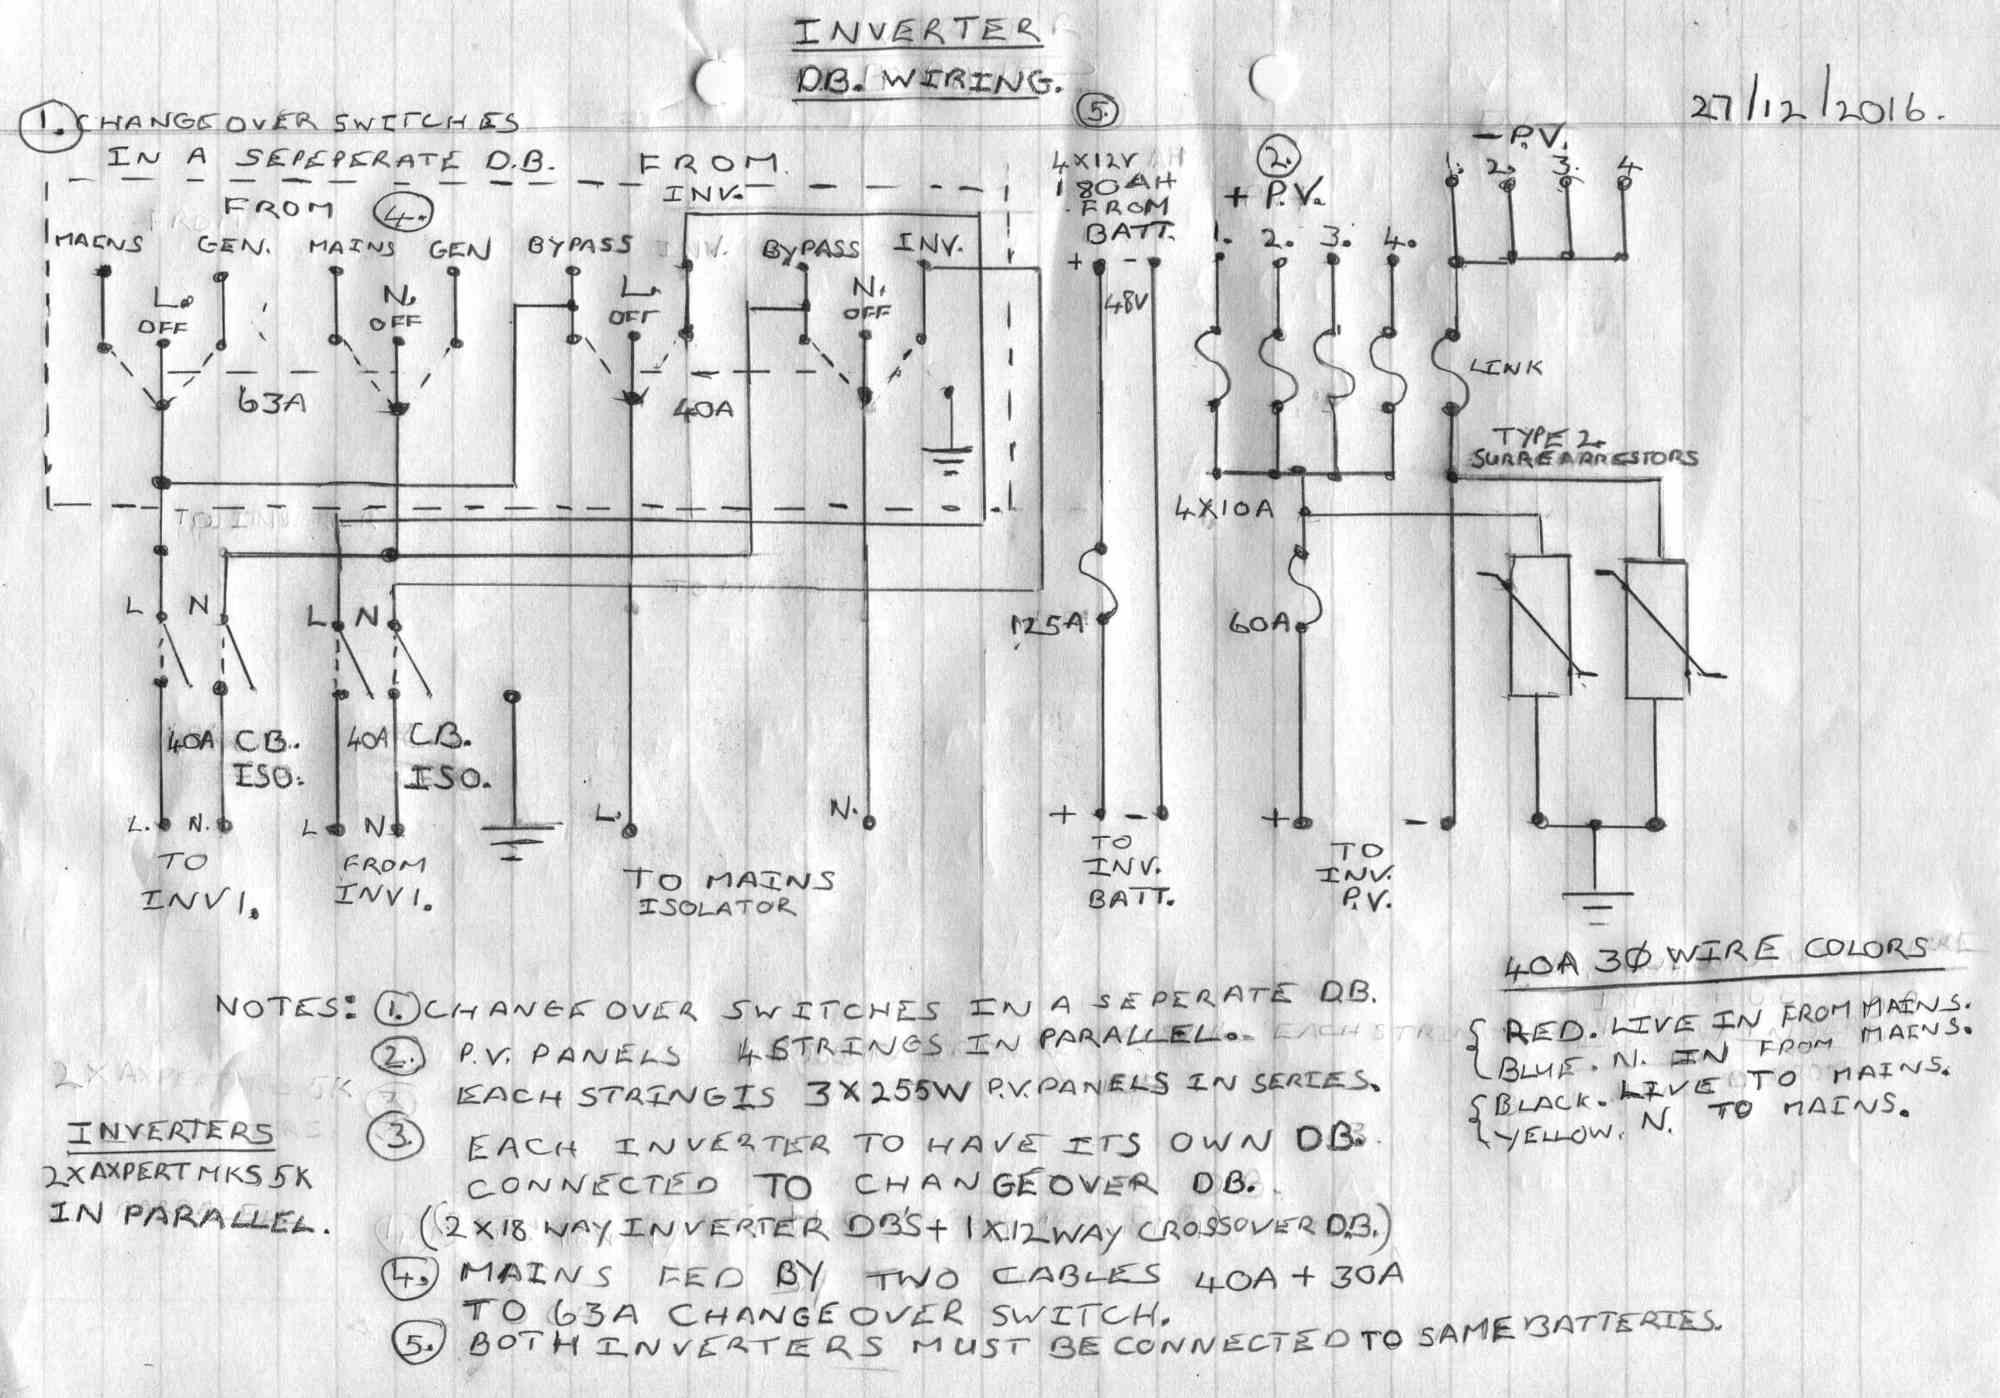 hight resolution of jpg axpert mks 5k 3060w pv wiring diagram 27122016 small jpg